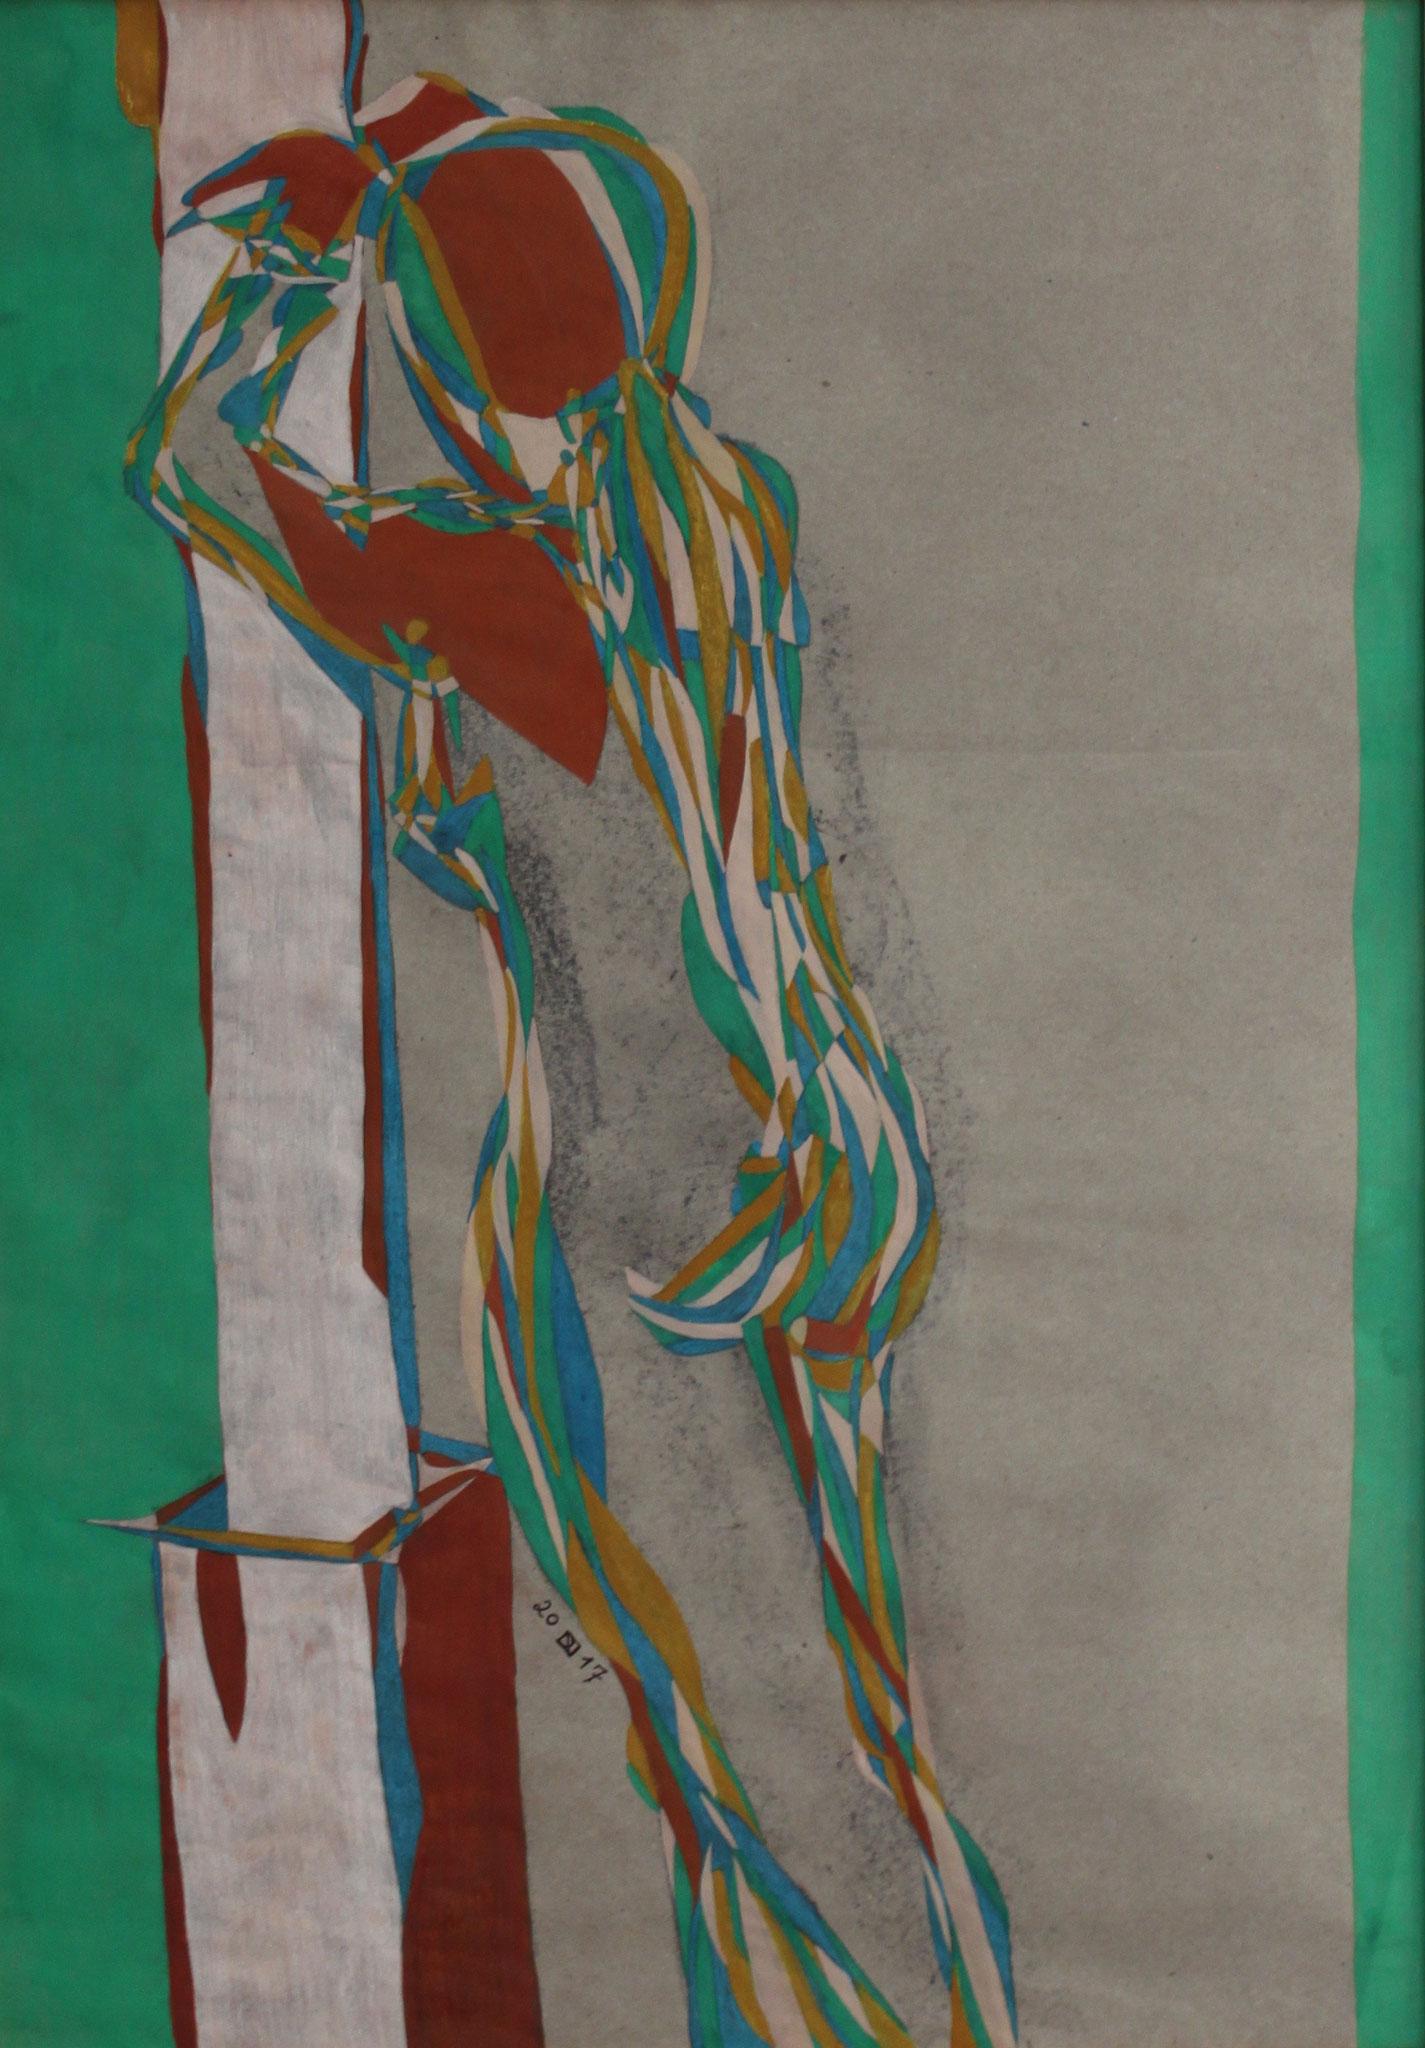 Leaning, Aquarell und Buntstift auf Papier, 2017, 59 cm x 42 cm